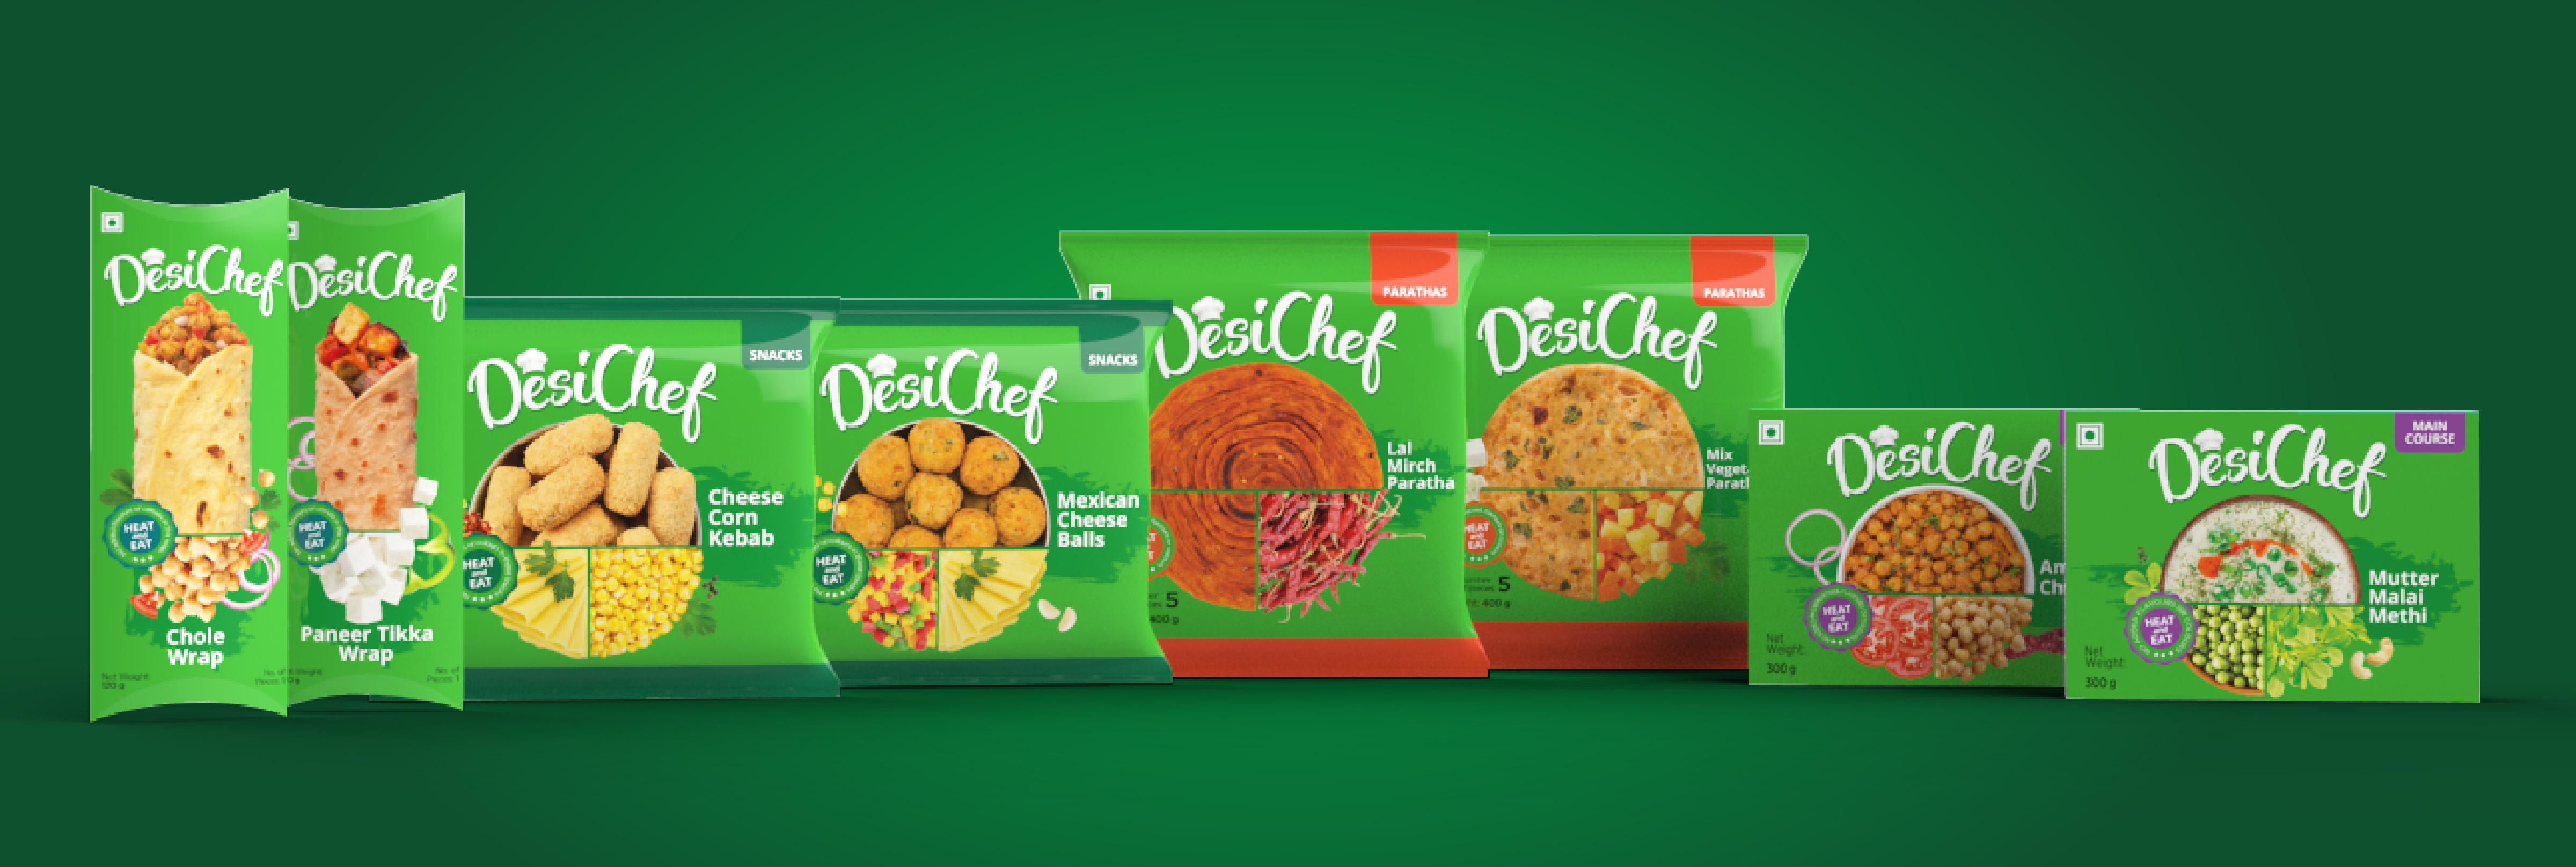 Brand & Packaging Design for Desi Chef -  Frozen food Brand